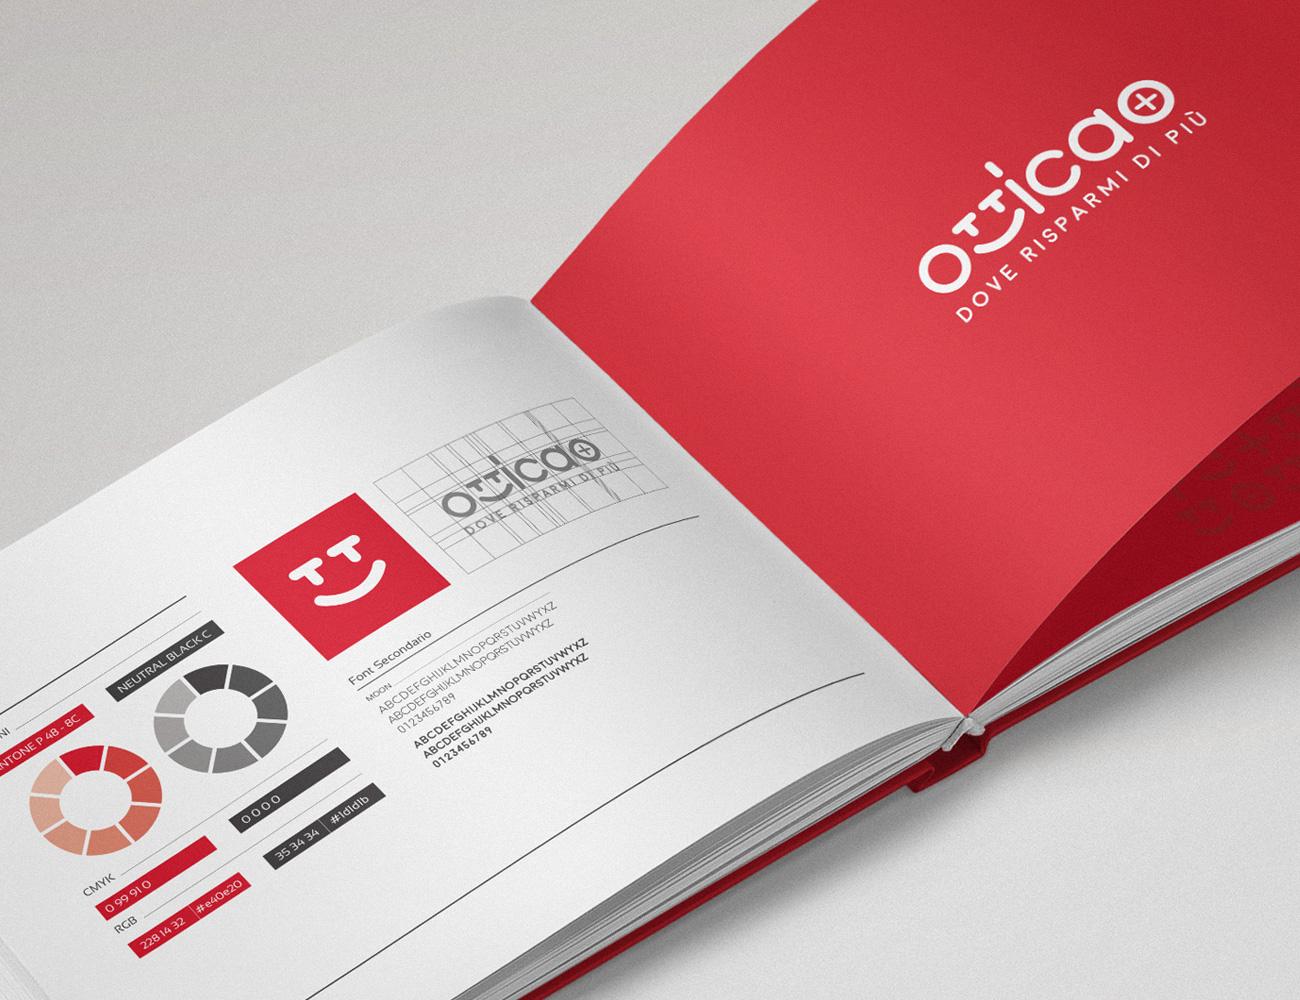 creazione-marchio-logo-ottica-piu-dove-risparmi-di-piu-simone-roveda-digit81-02